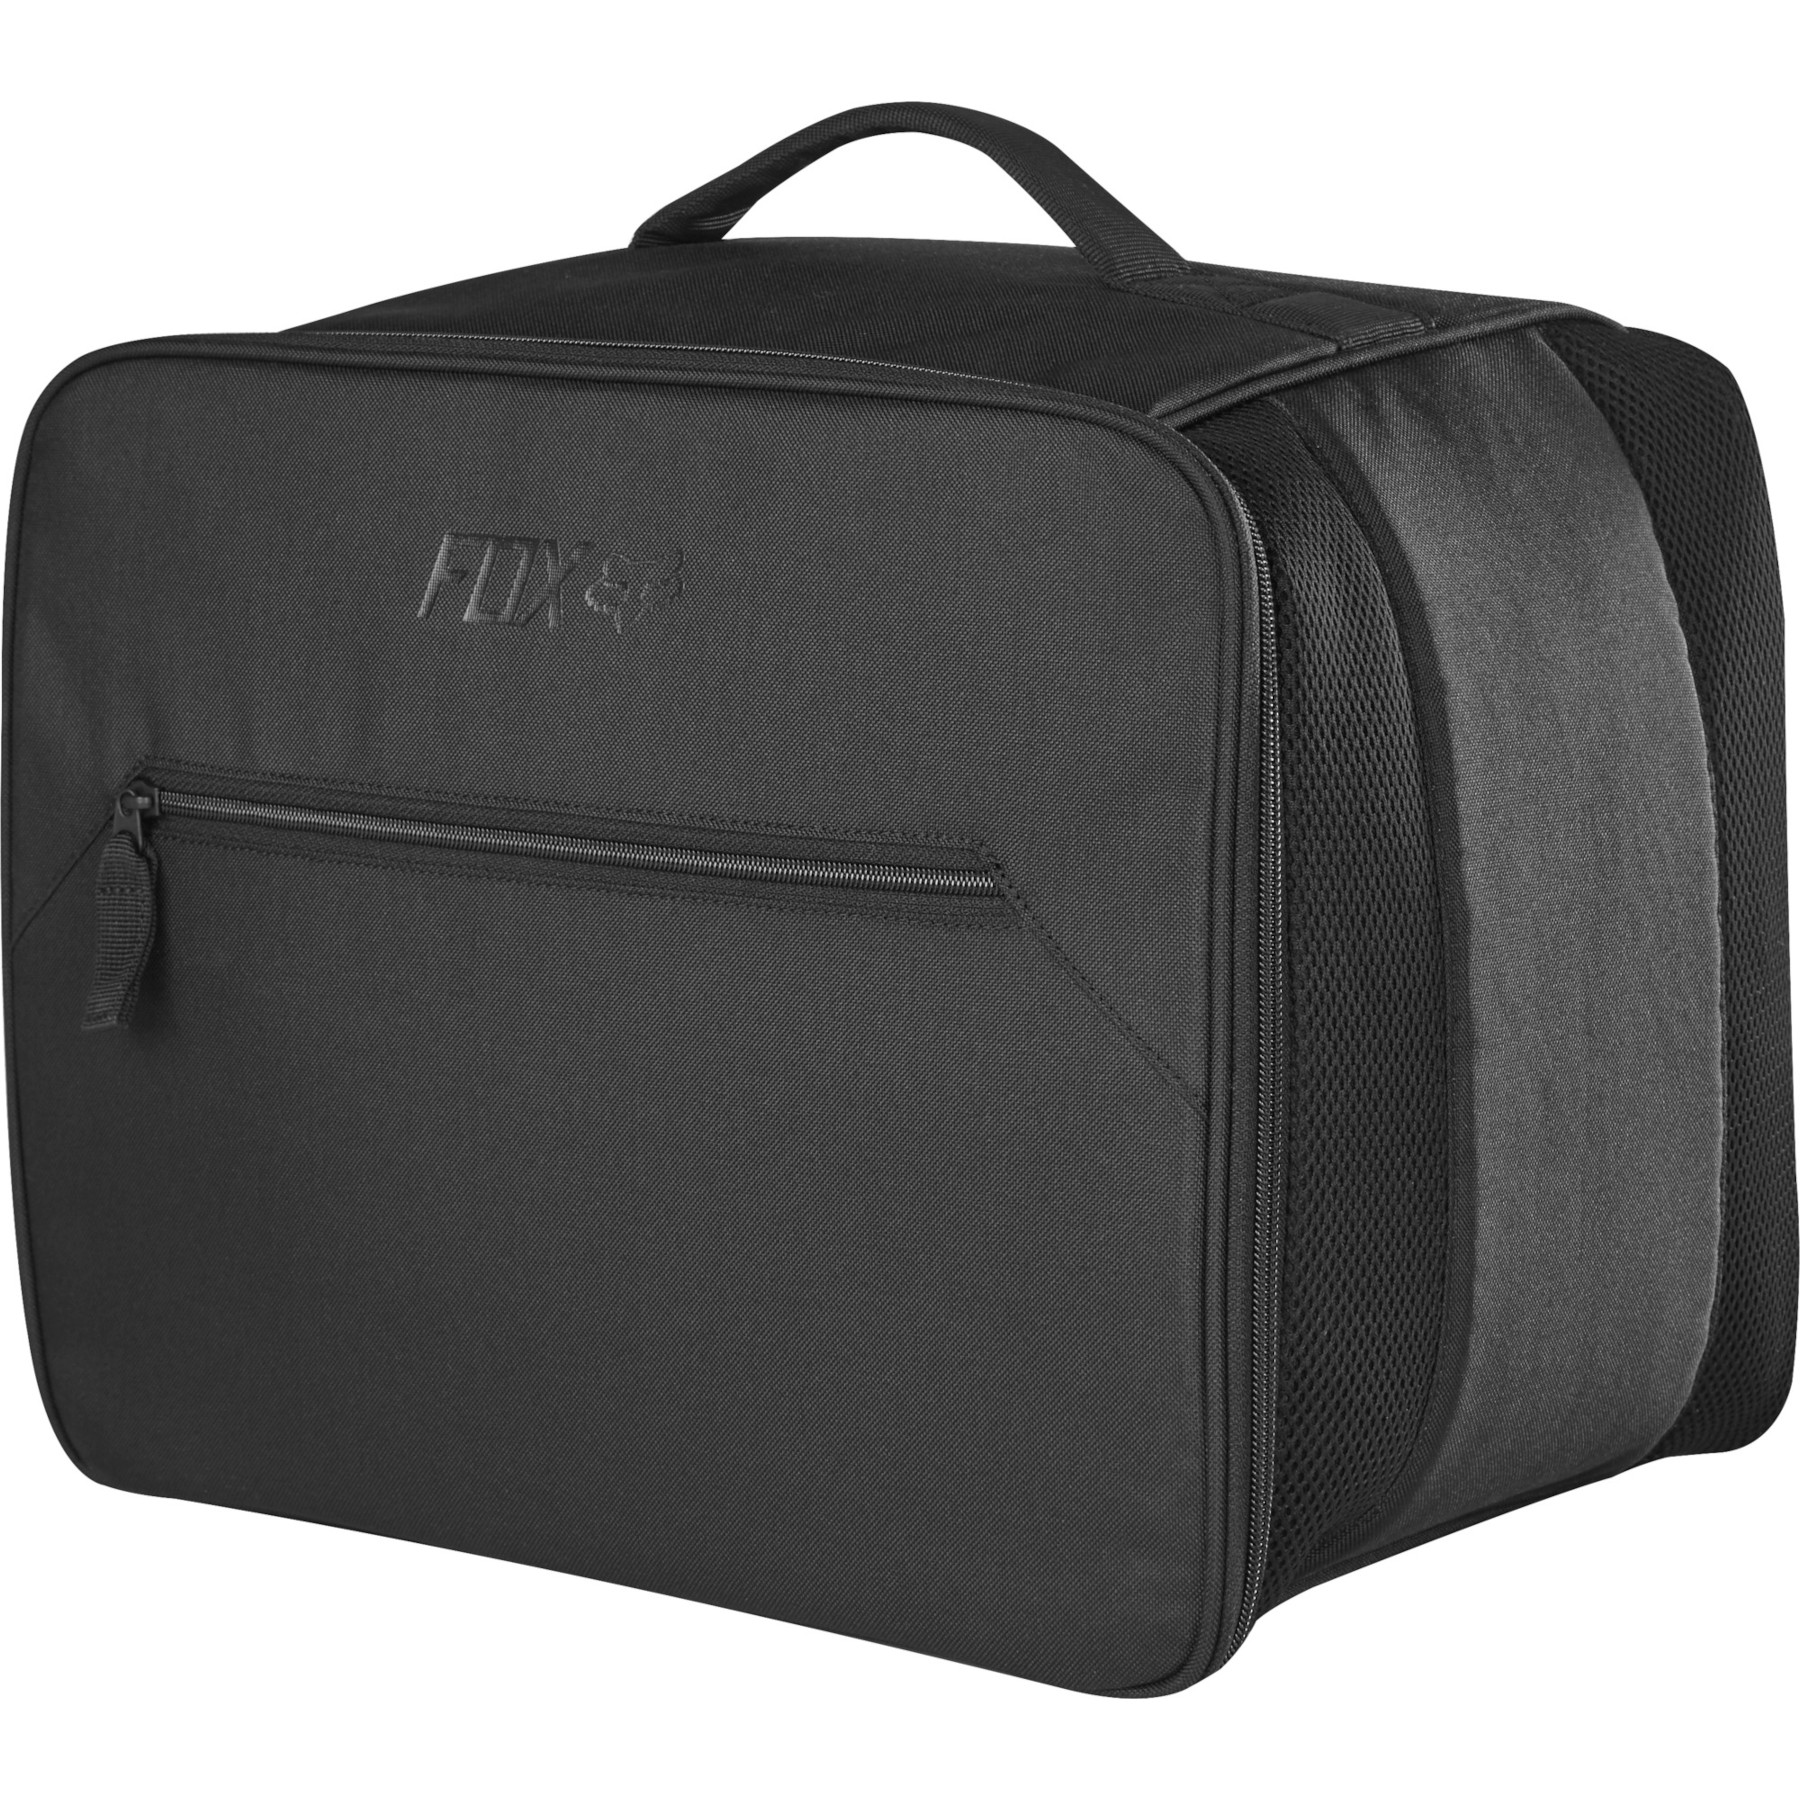 Fox MX Helmet Bag - black